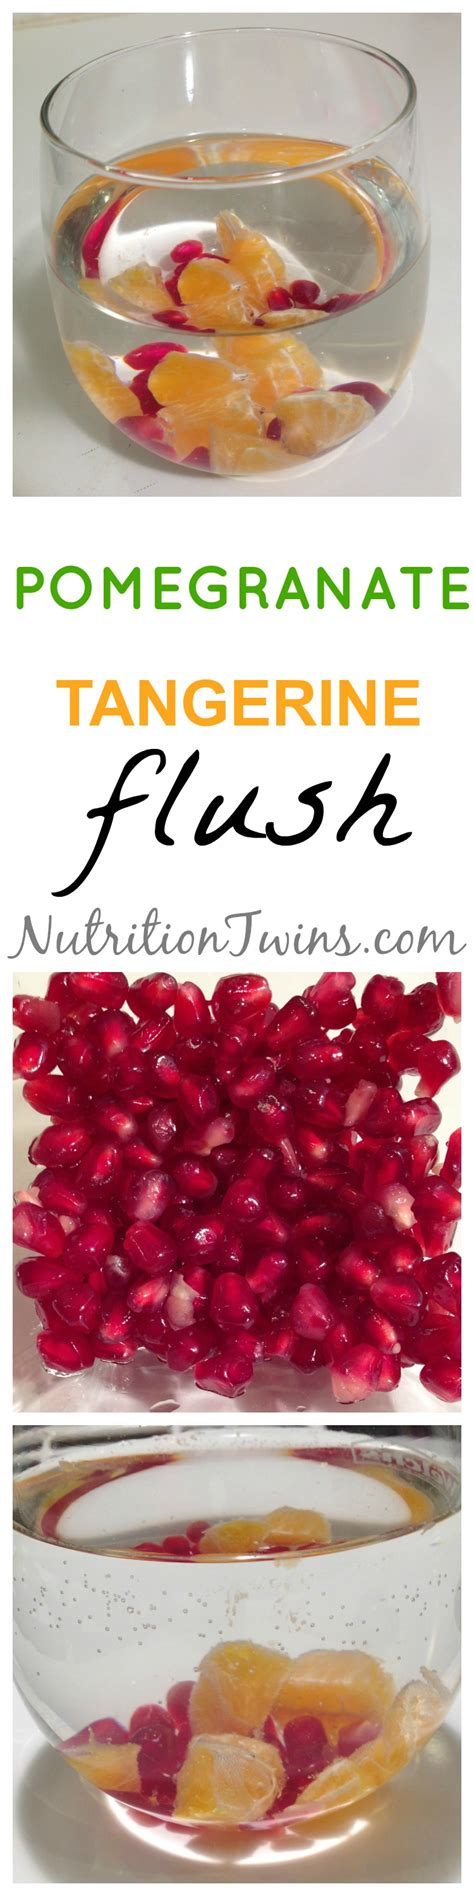 Can You Detox On Pomegranetes by Pomegranate Tangerine Detox Flusher Nutrition